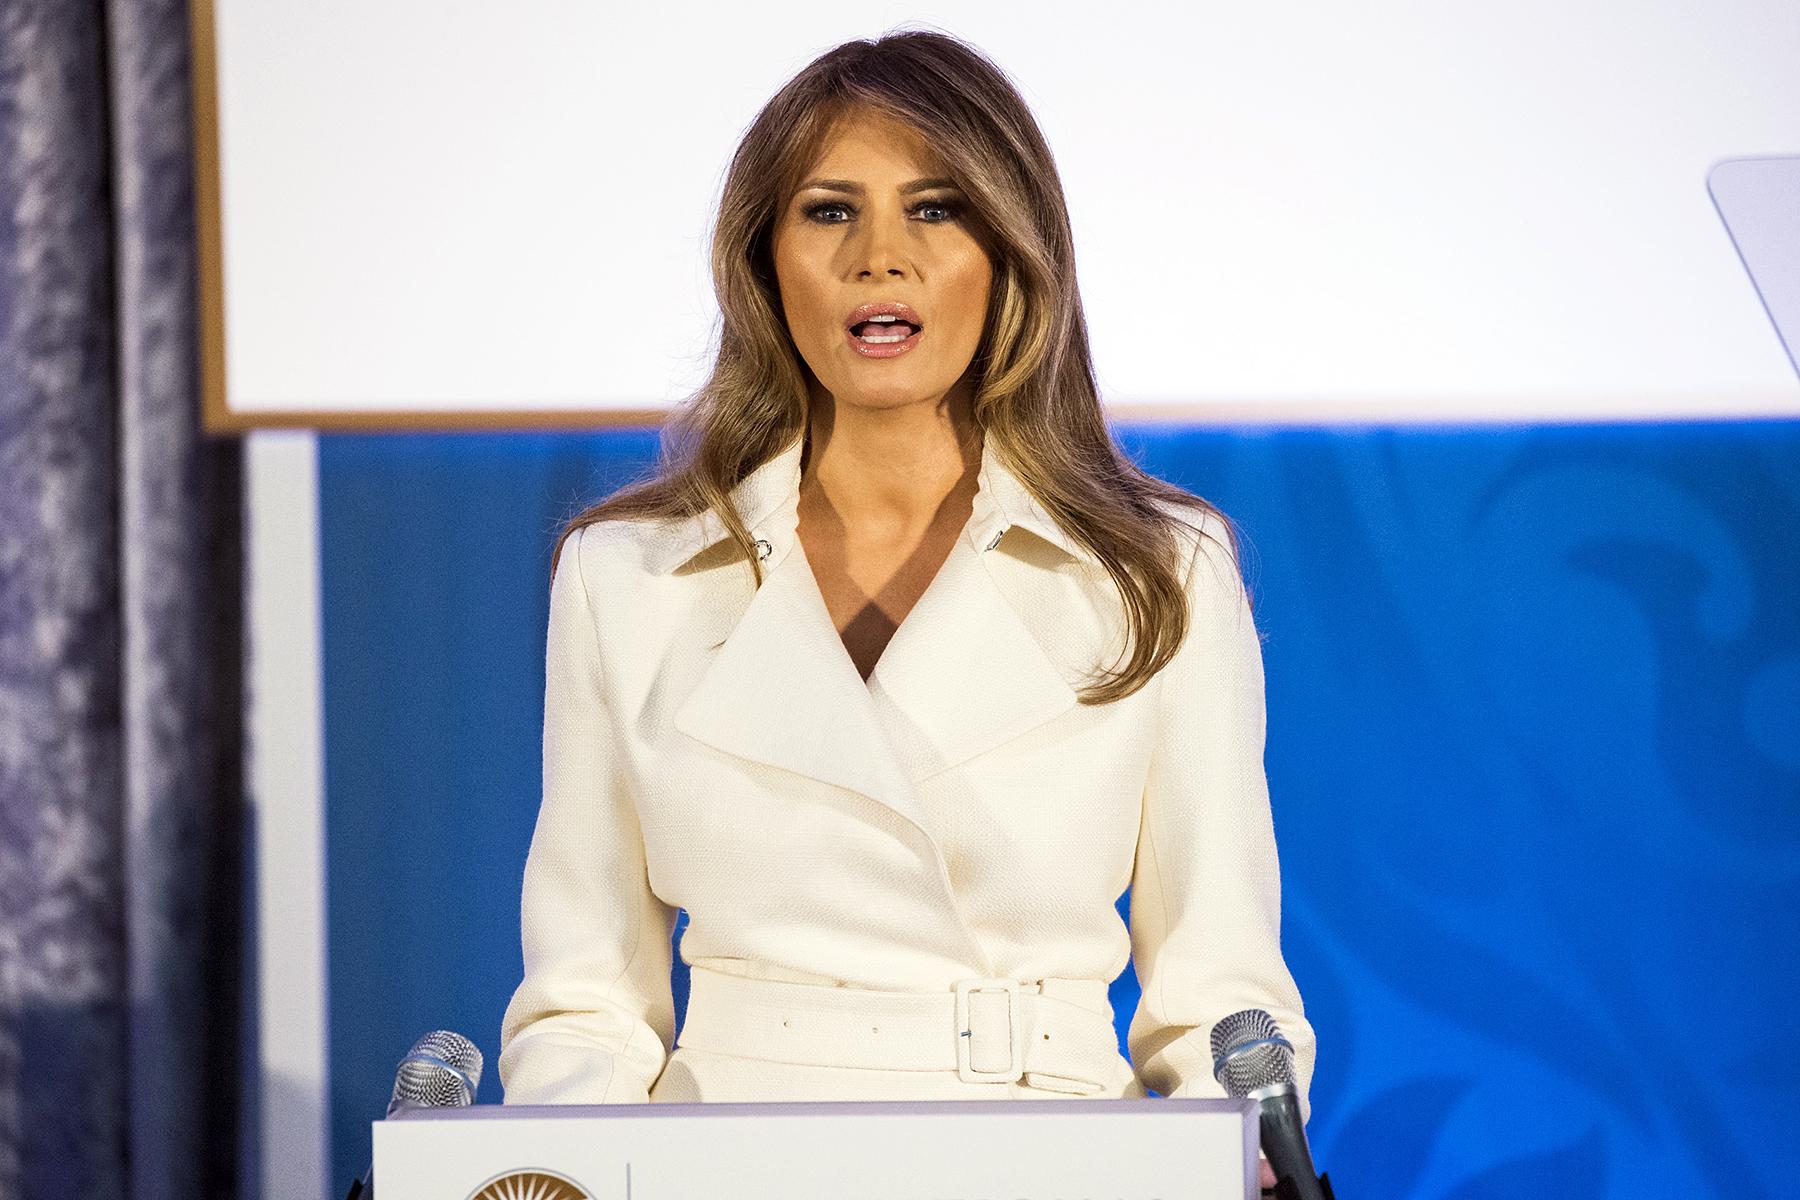 Melania Trump International Women of Courage Awards IWOC